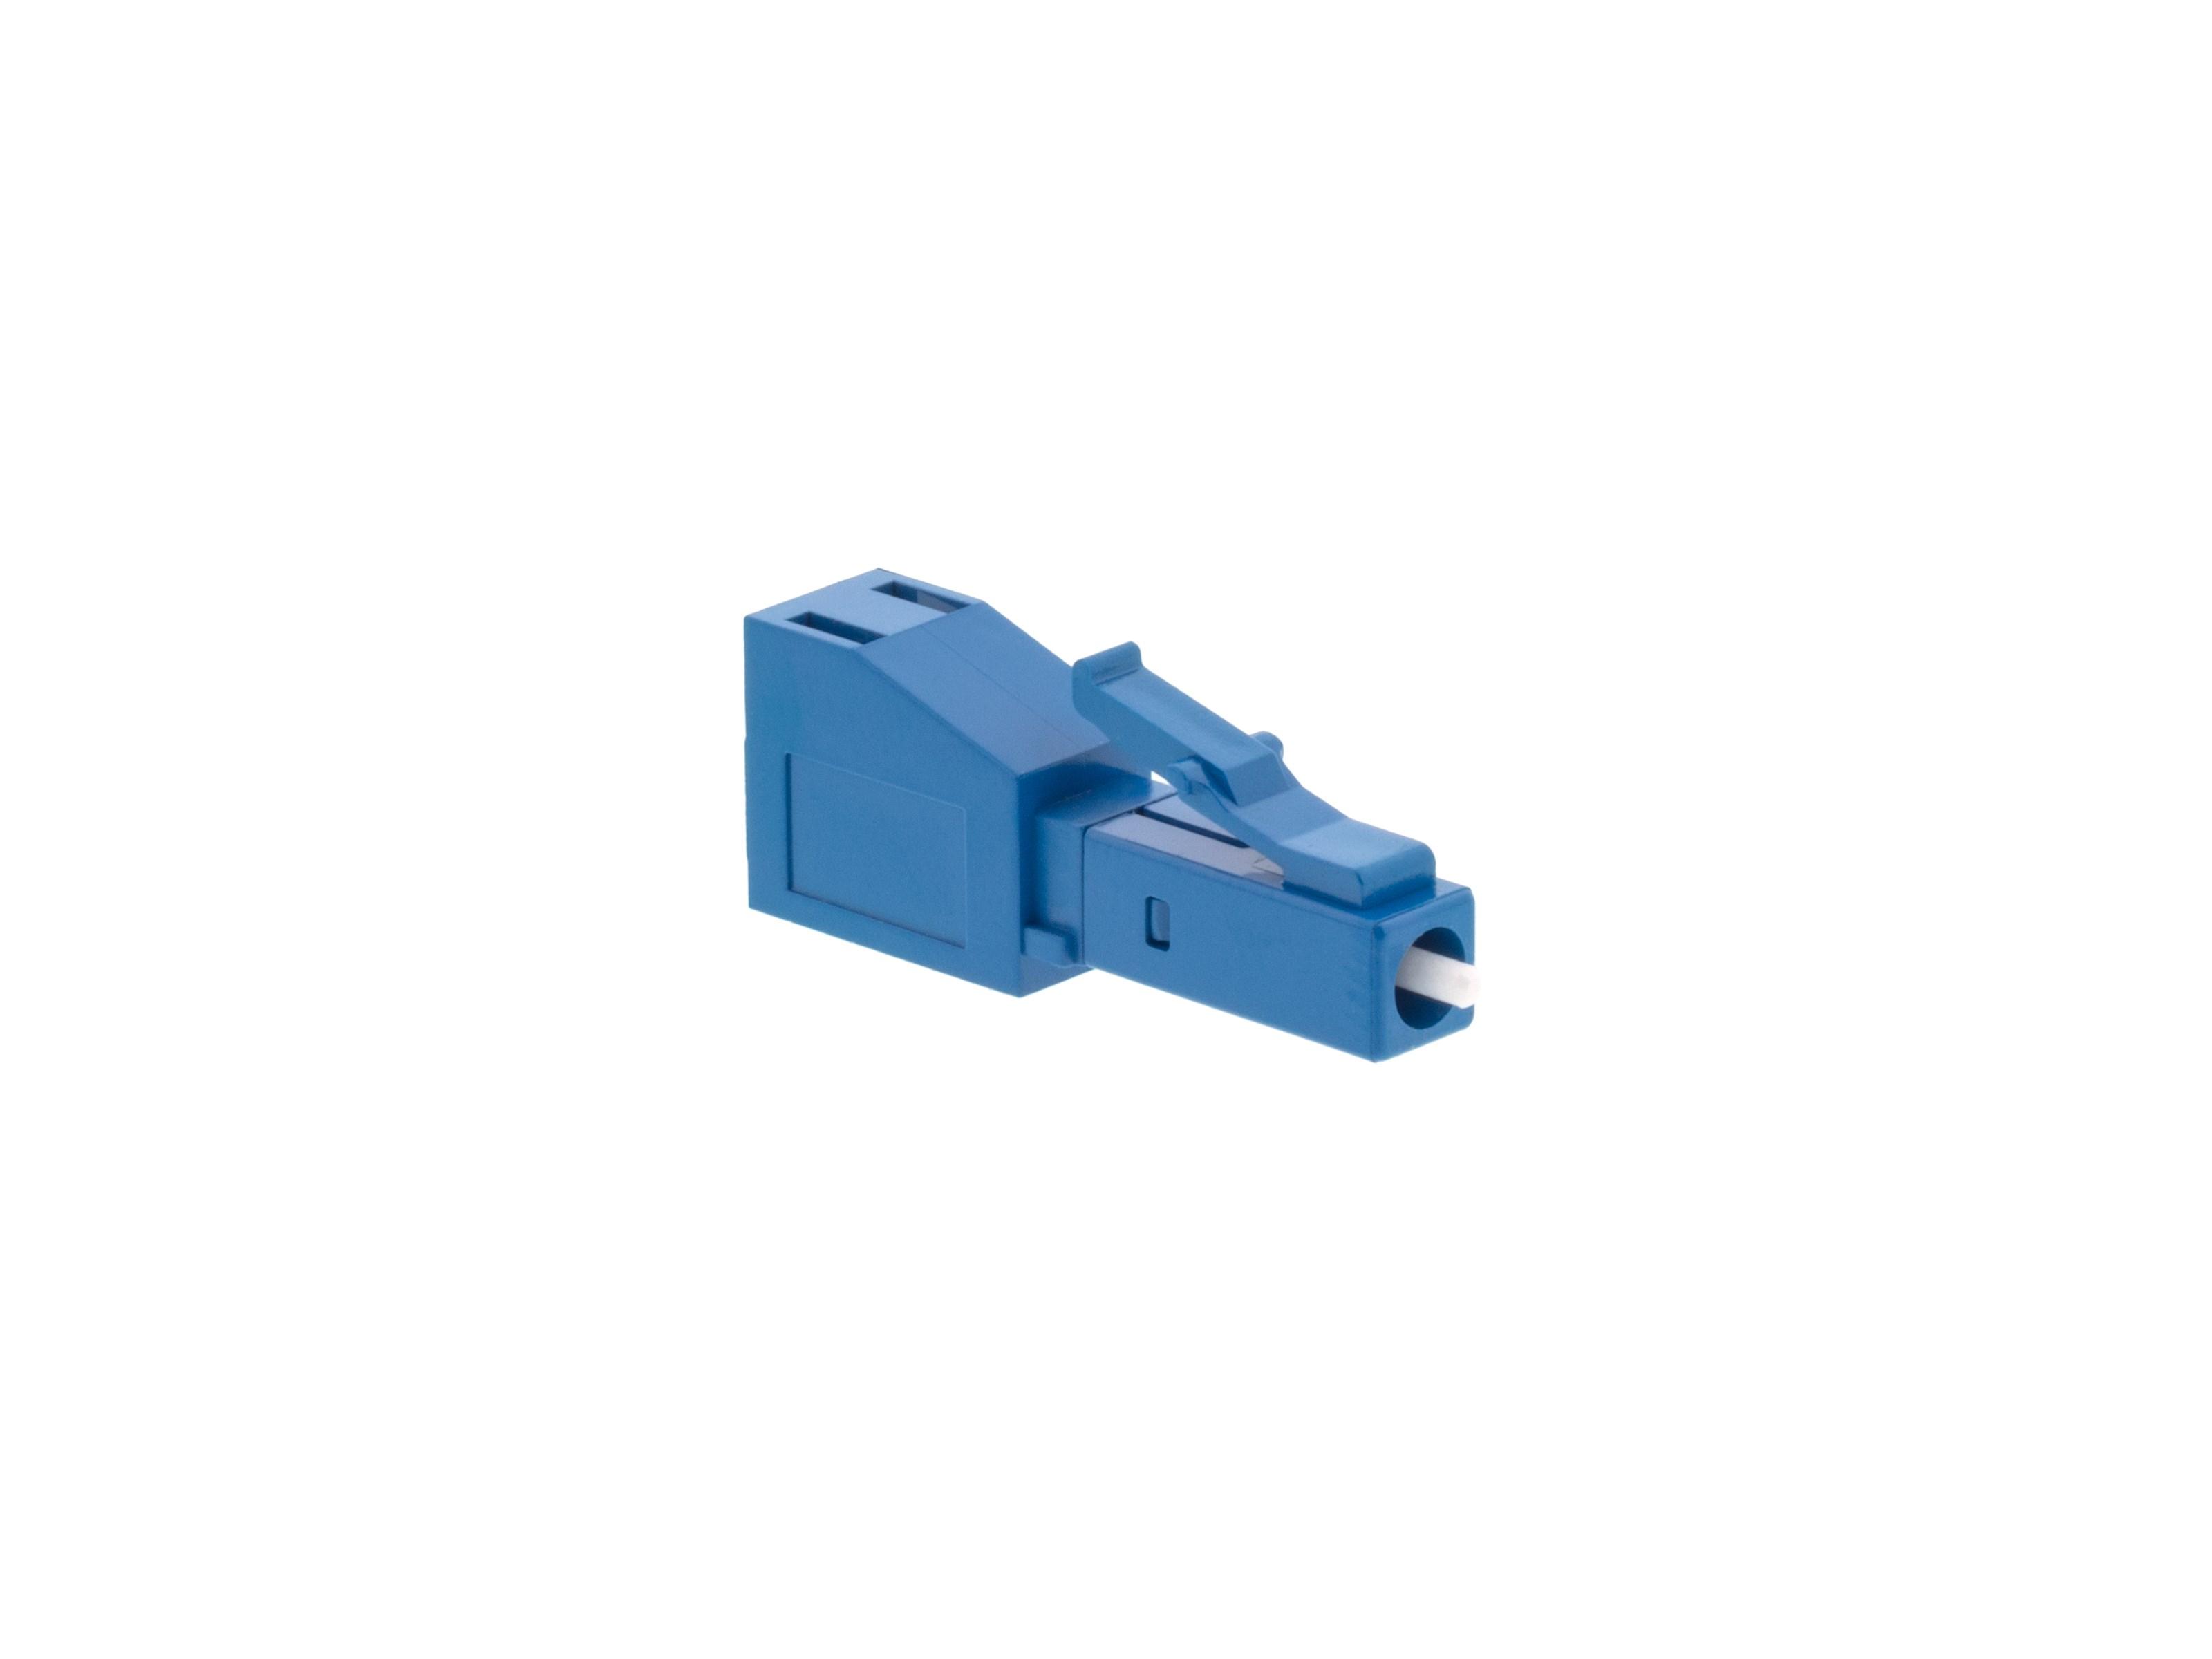 UPC LC Fiber Optic Attenuator 20 dB